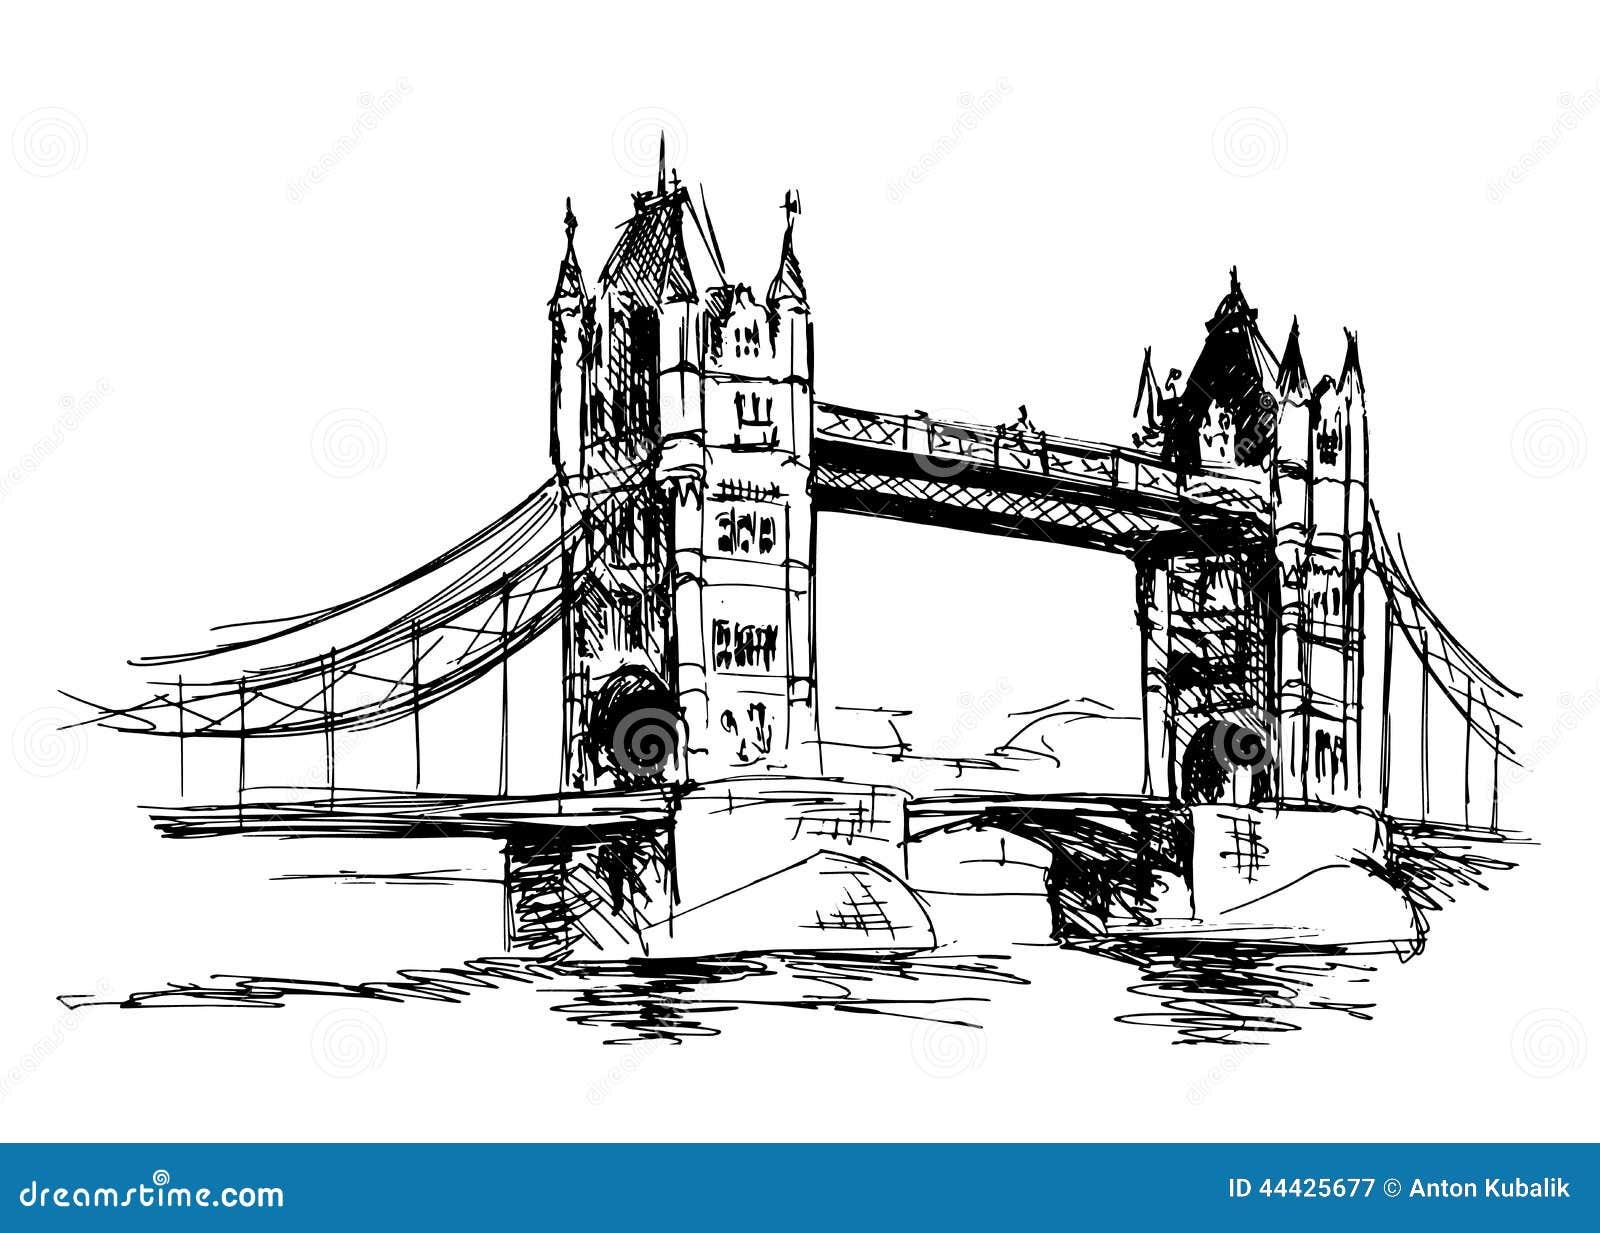 Sketch Tower Bridge Stock Illustration. Illustration Of Europe - 44425677